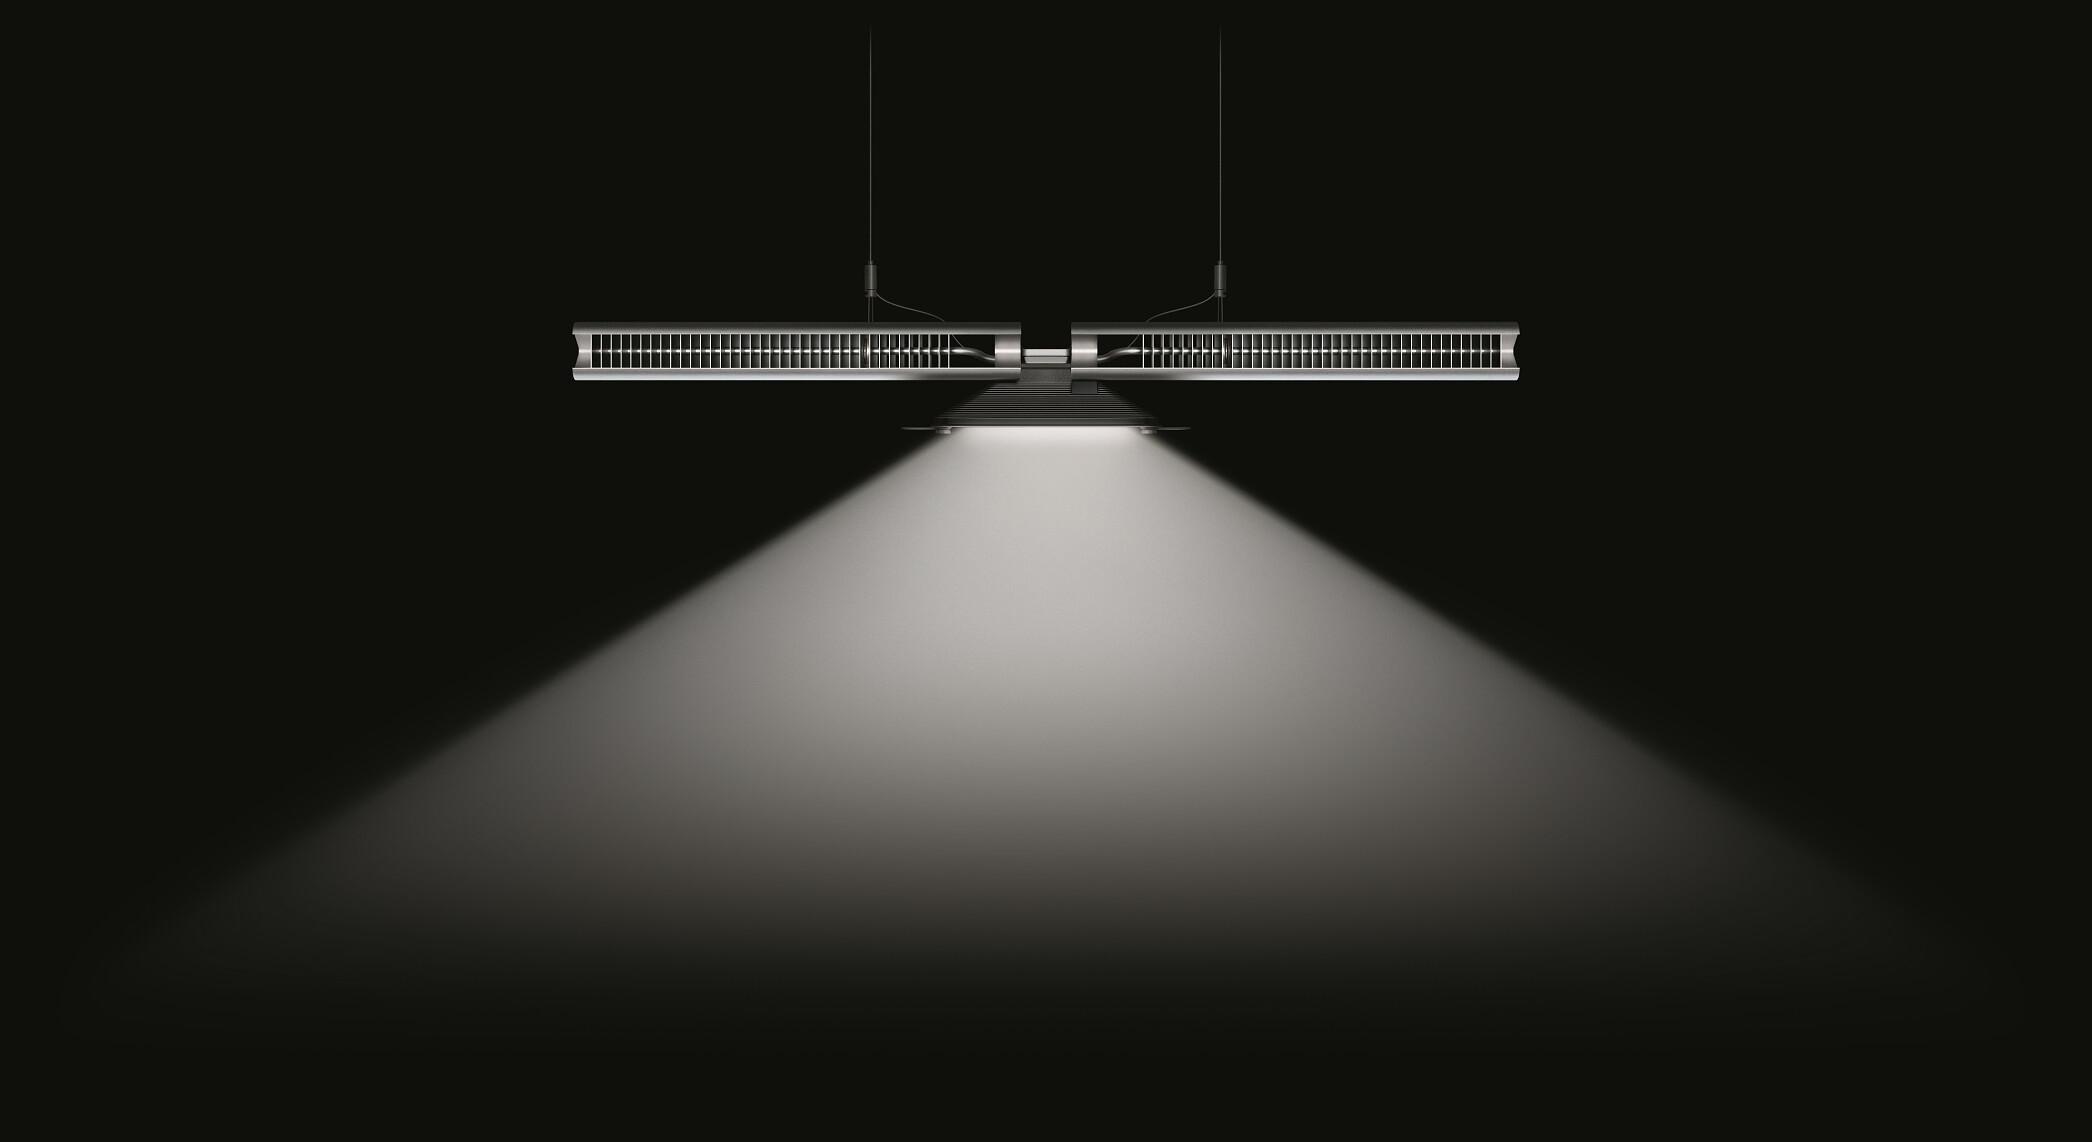 DYSON CU-BEAM™ SUSPENDED LIGHT